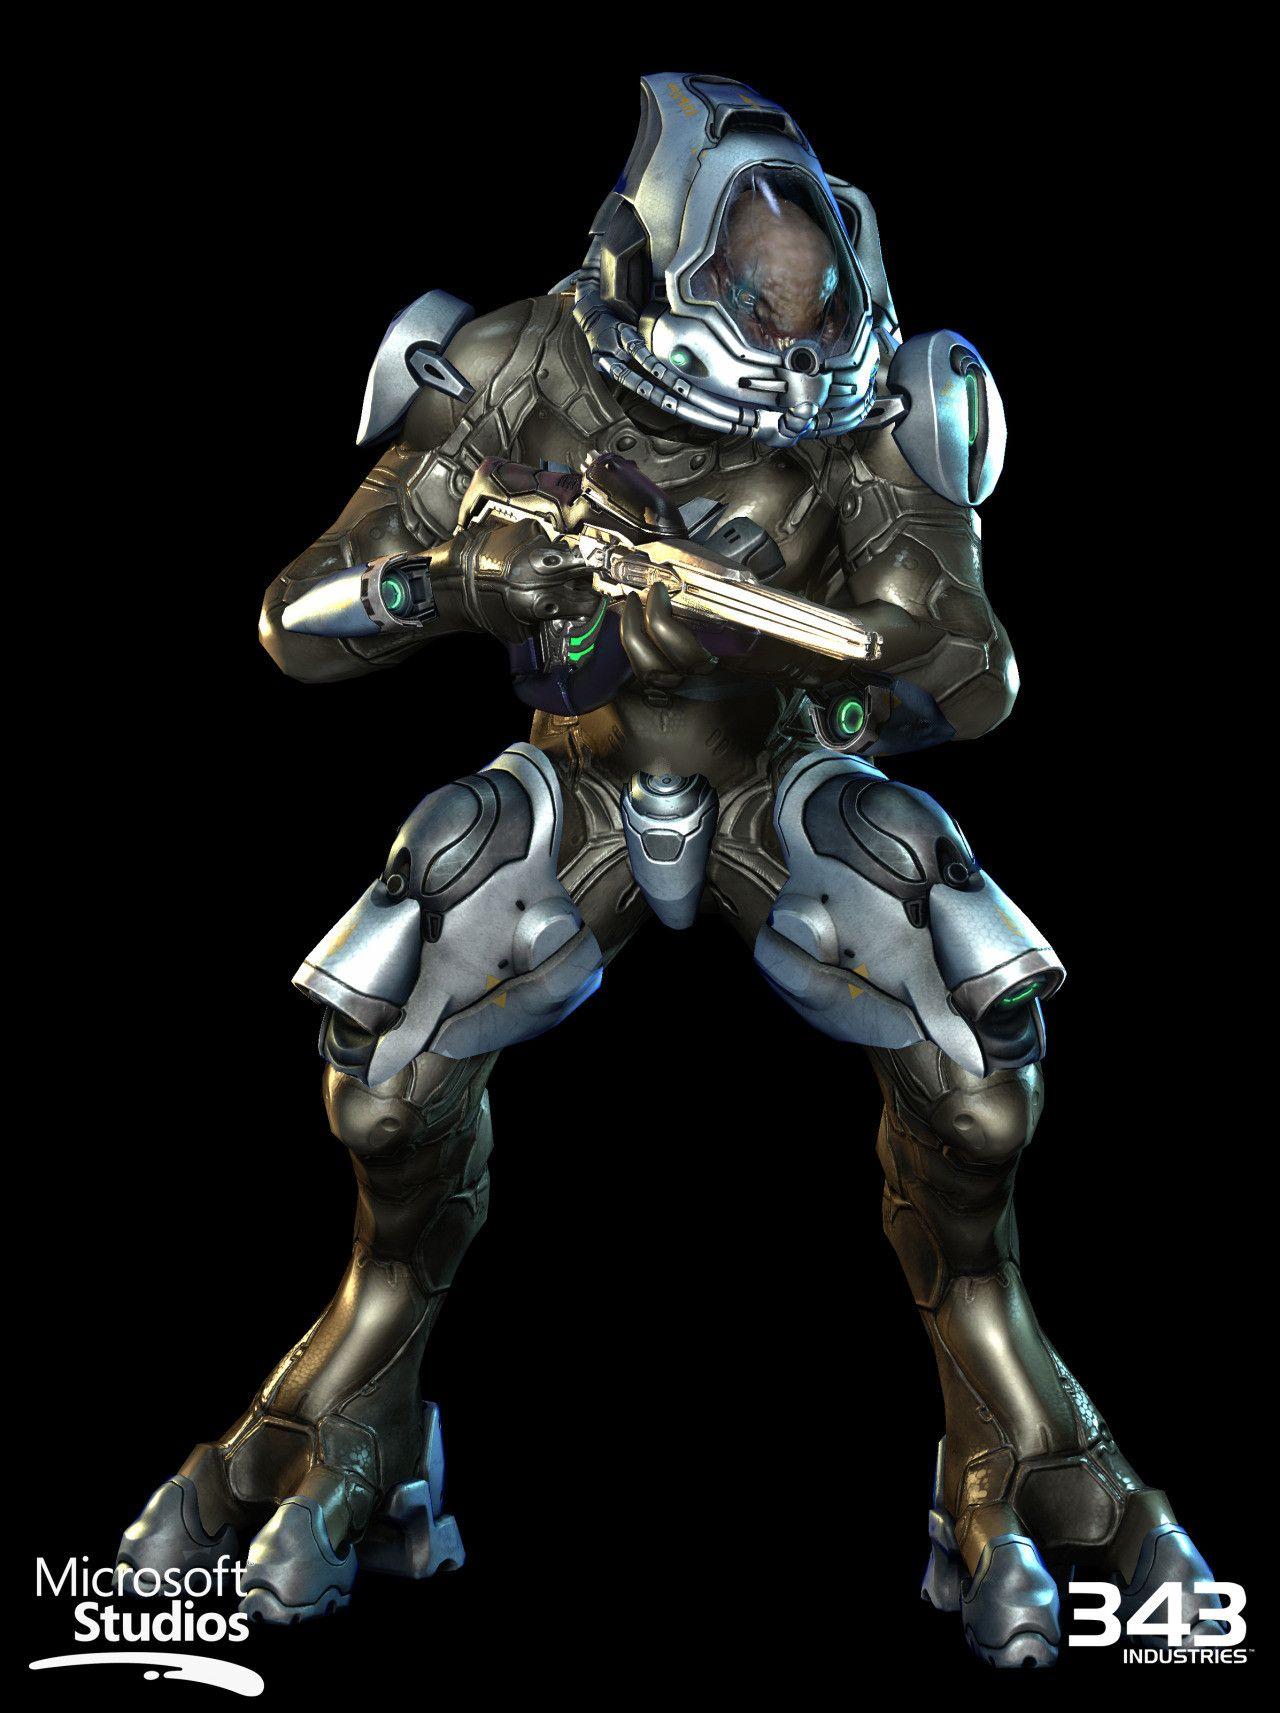 ArtStation - Halo 4 - Space Elite / Elite Techsuit, Kyle Hefley ...